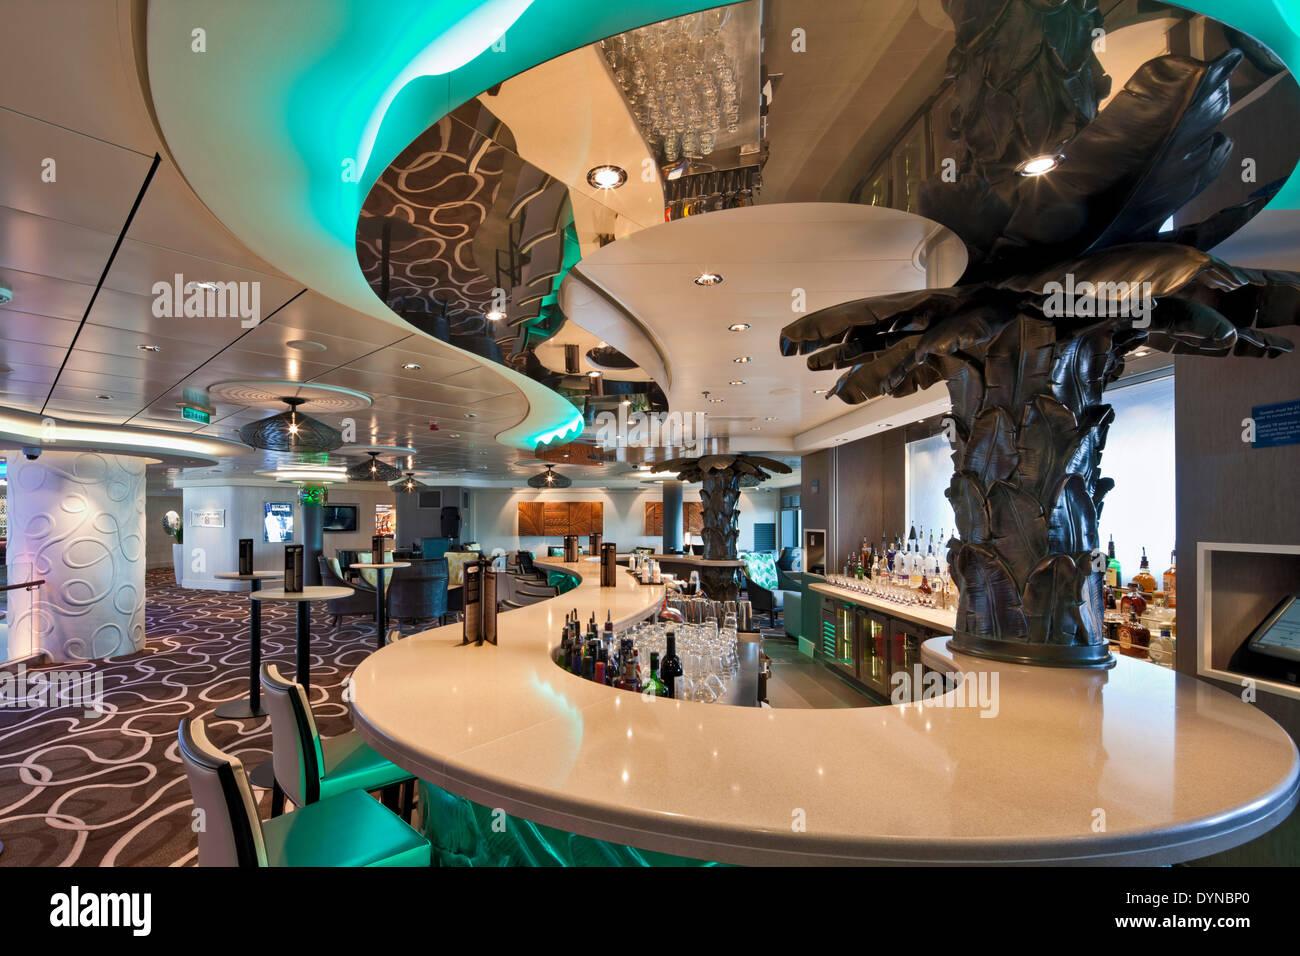 Norwegian Getaway Cruise Ship Southampton United Kingdom Stock - Ice bar on cruise ship